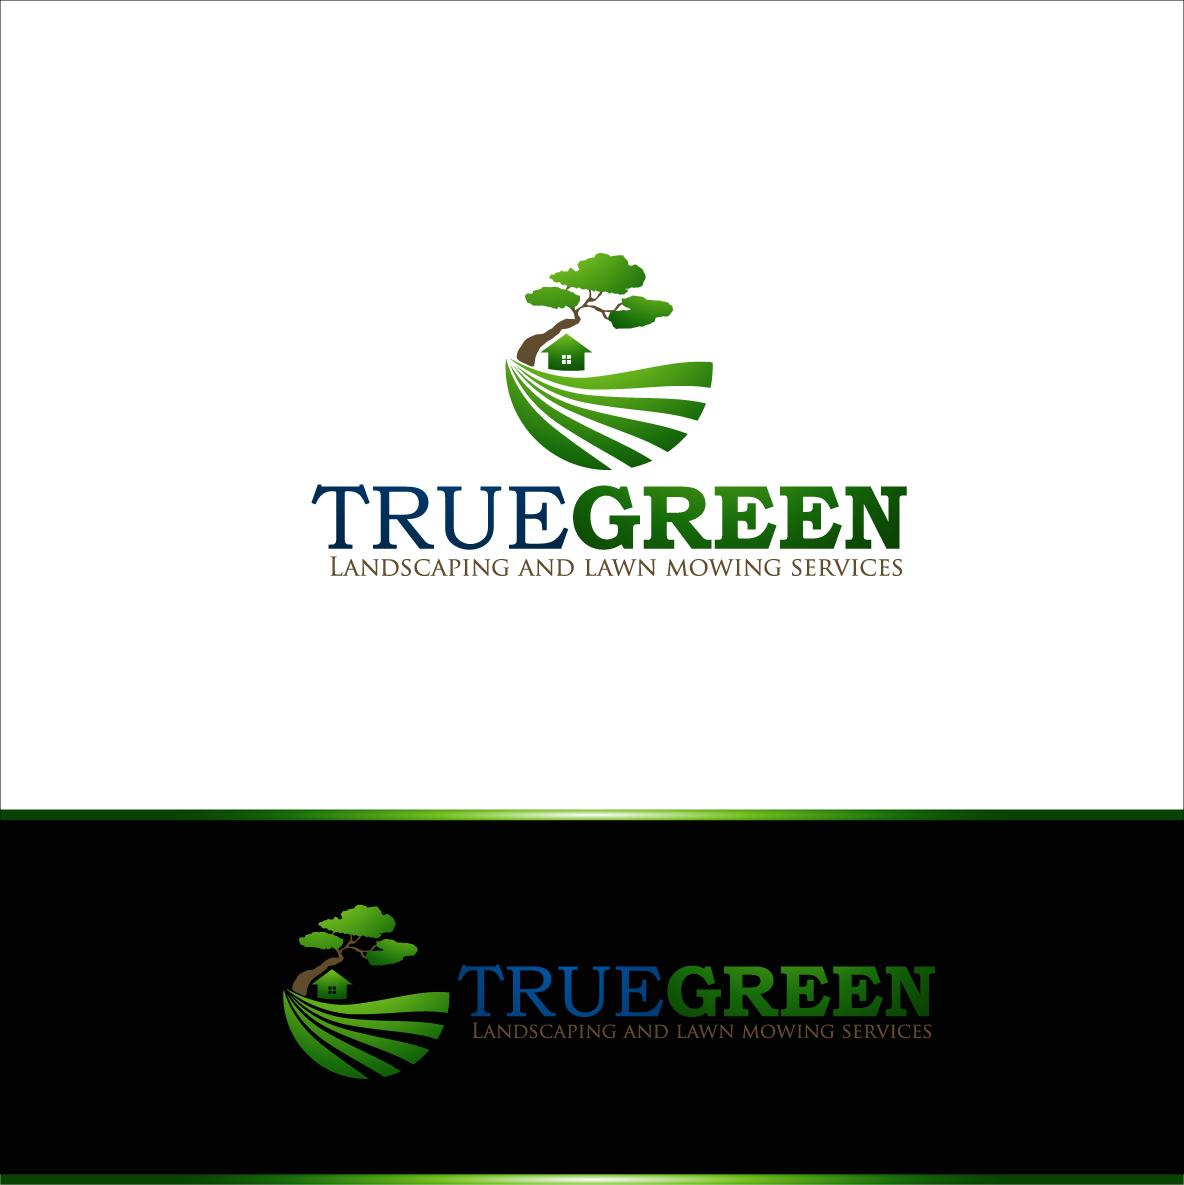 Logo Design by zoiDesign - Entry No. 32 in the Logo Design Contest Fun Logo Design for TRUE GREEN.